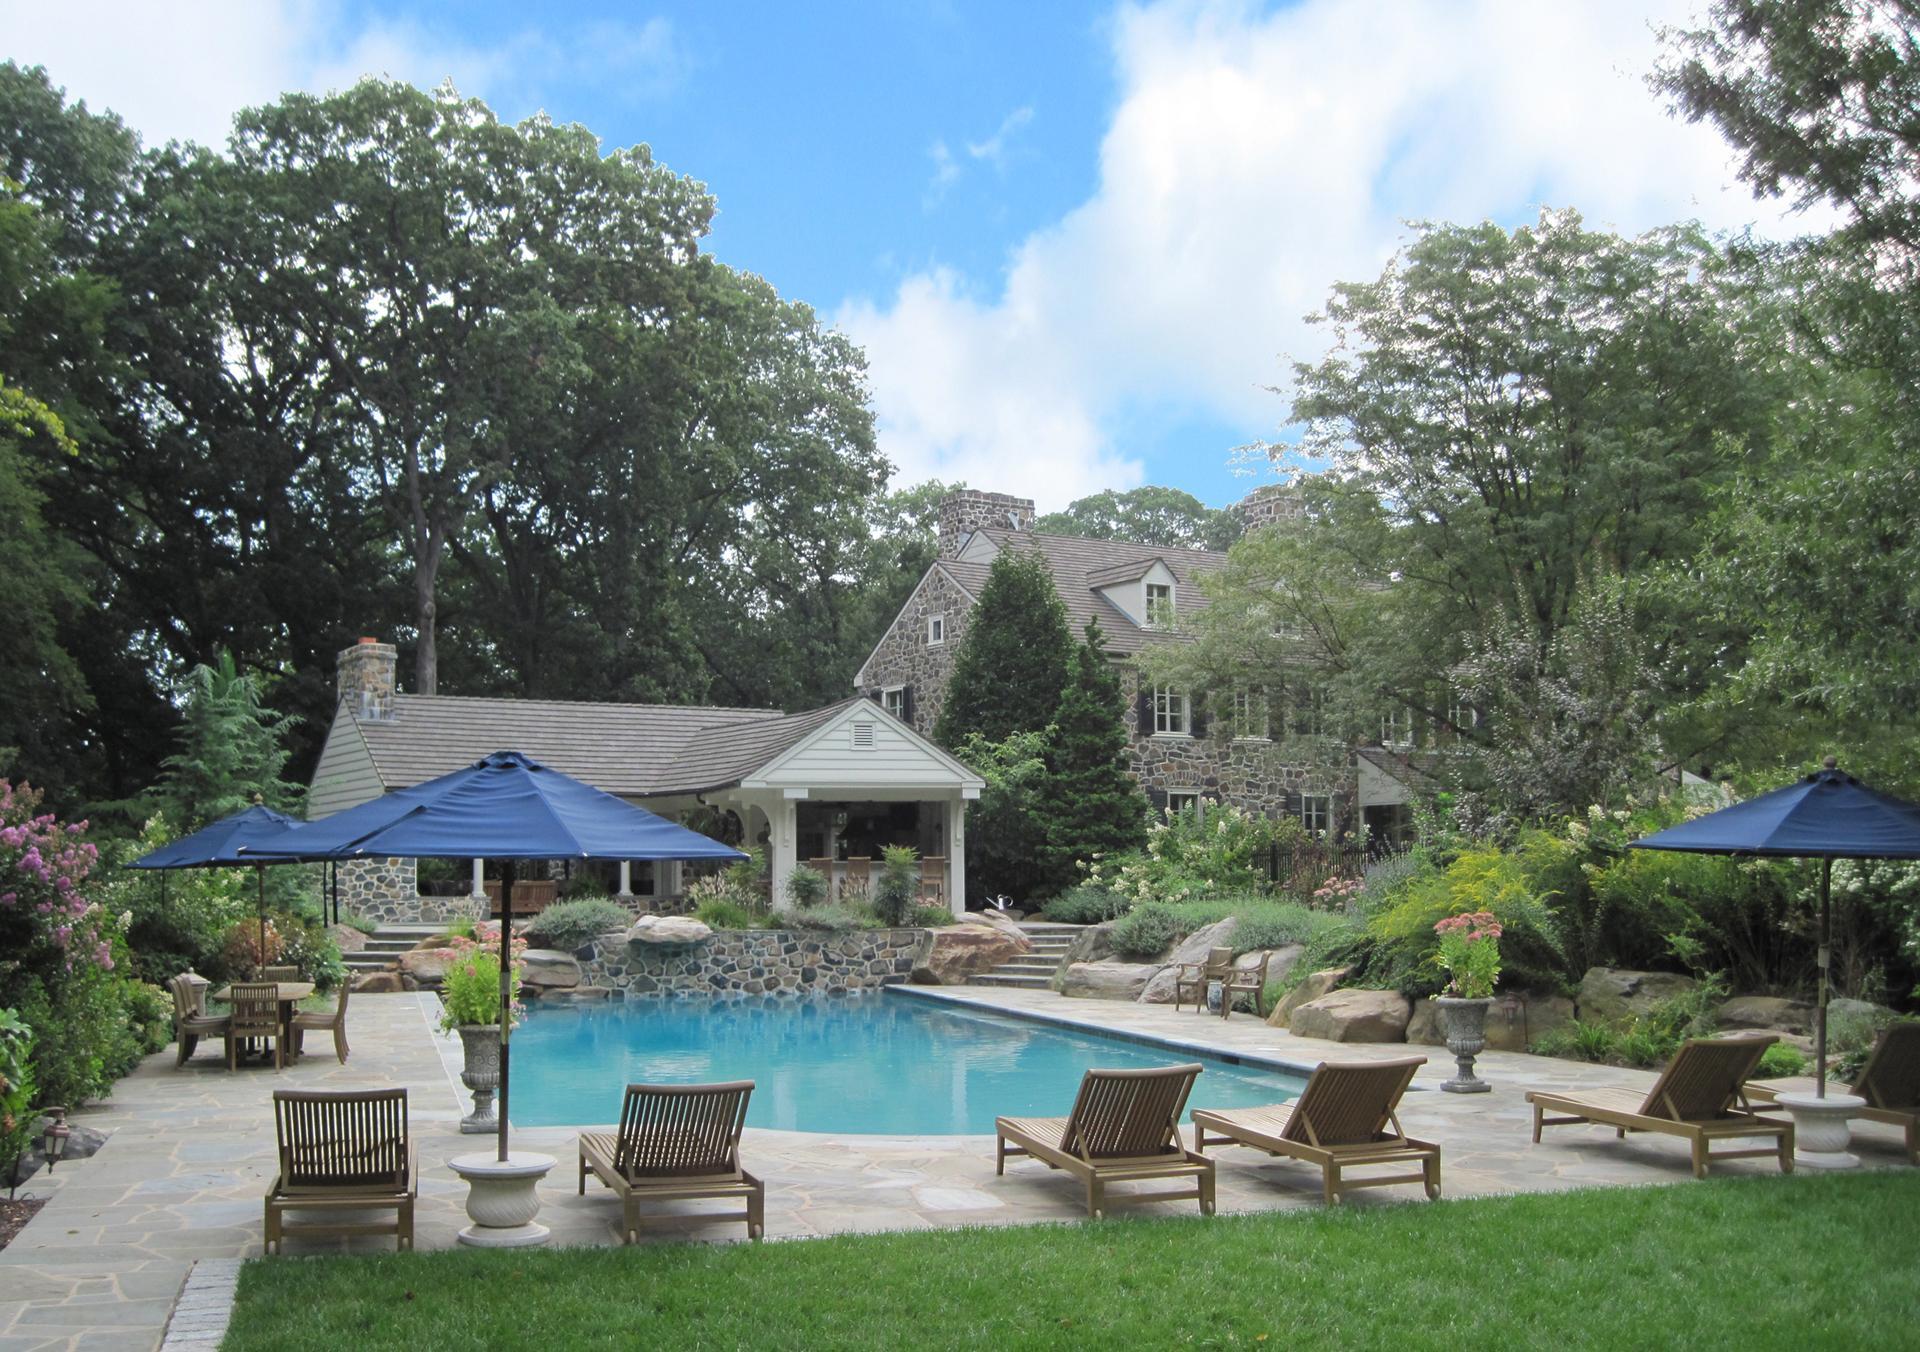 custom-pool-stone-paving-outdoor-bar-brandywine-centerville-de